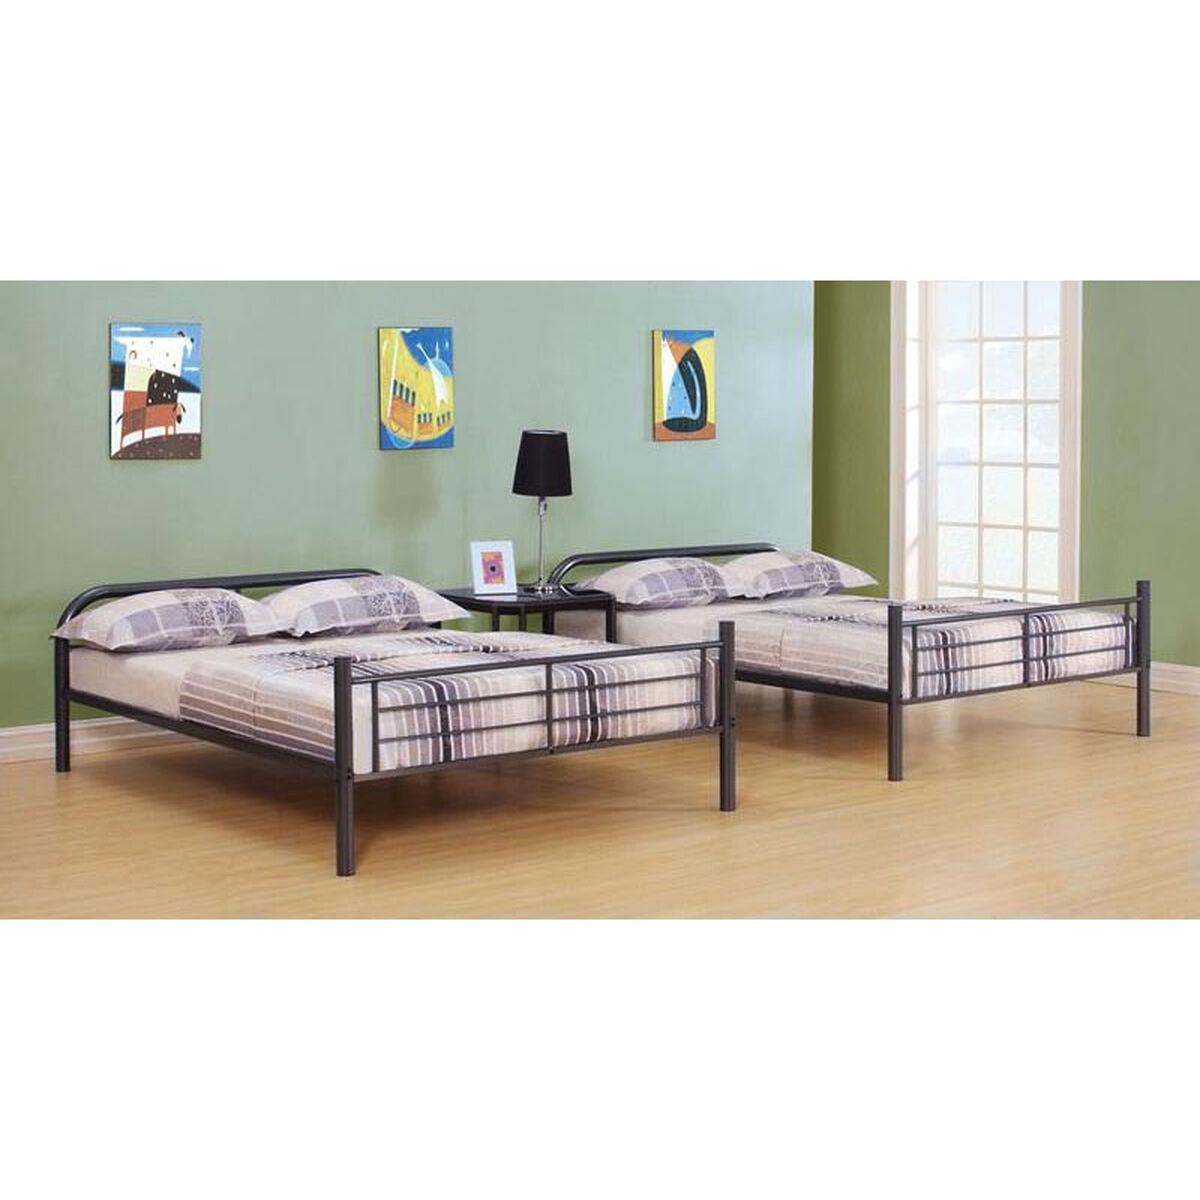 Acme furniture bristol full over full convertible metal for Reverse loft bed